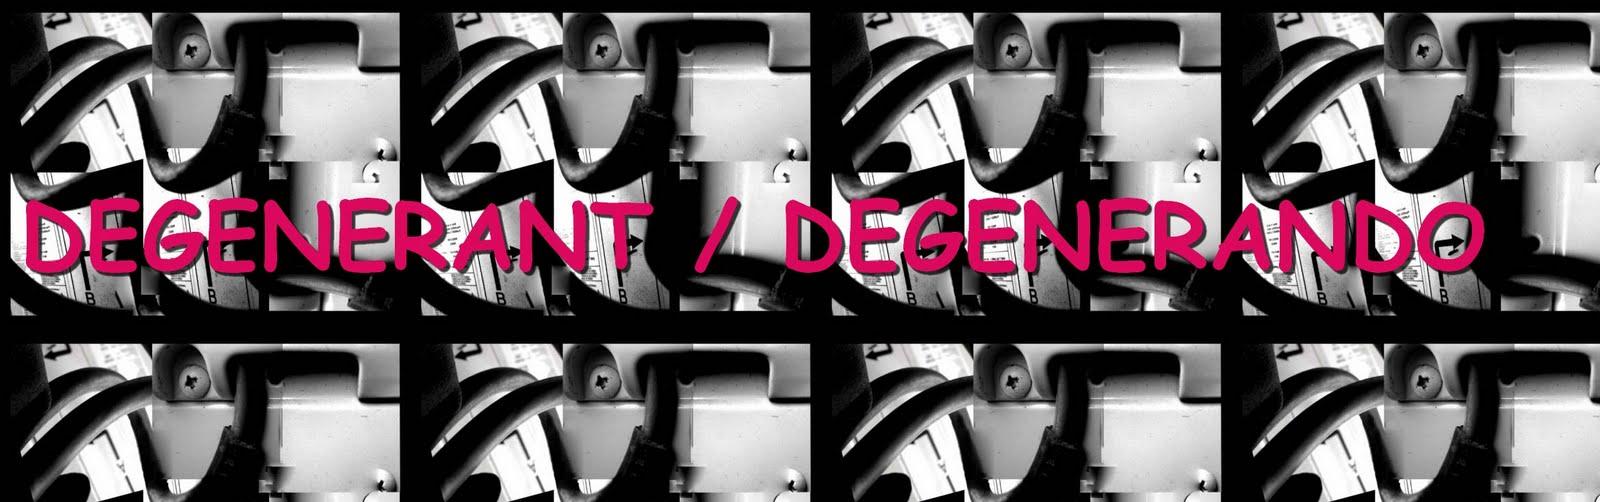 Degenerant/Degenerando